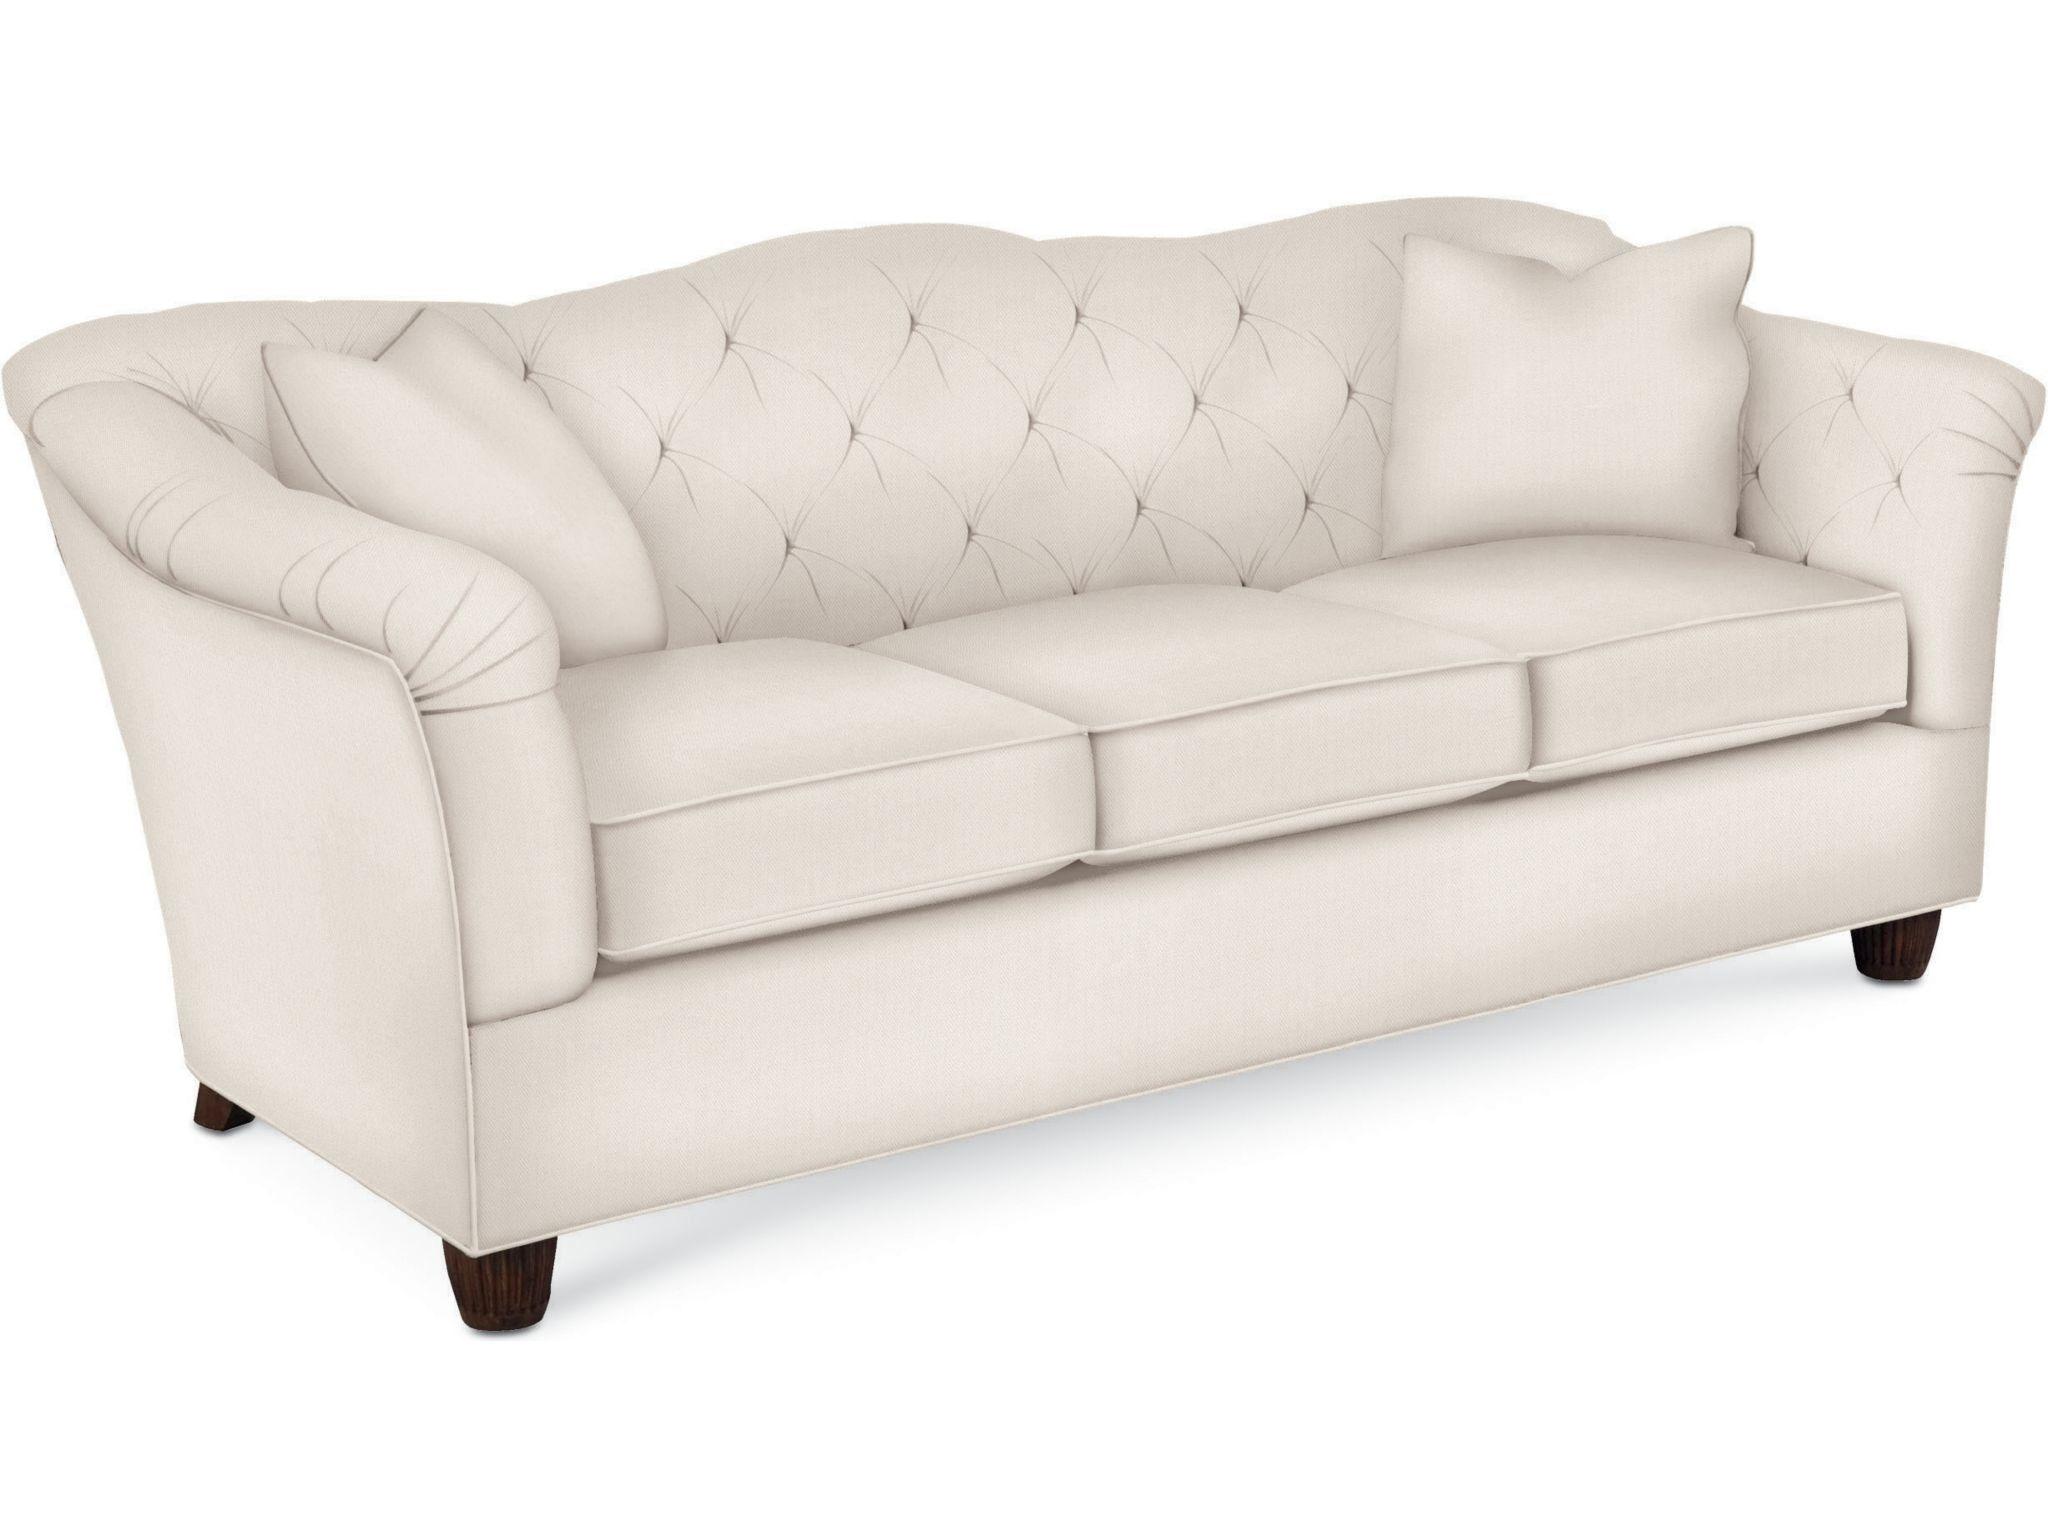 schnadig sofa 9090 preston thomasville living room ella 1718 11 whitley